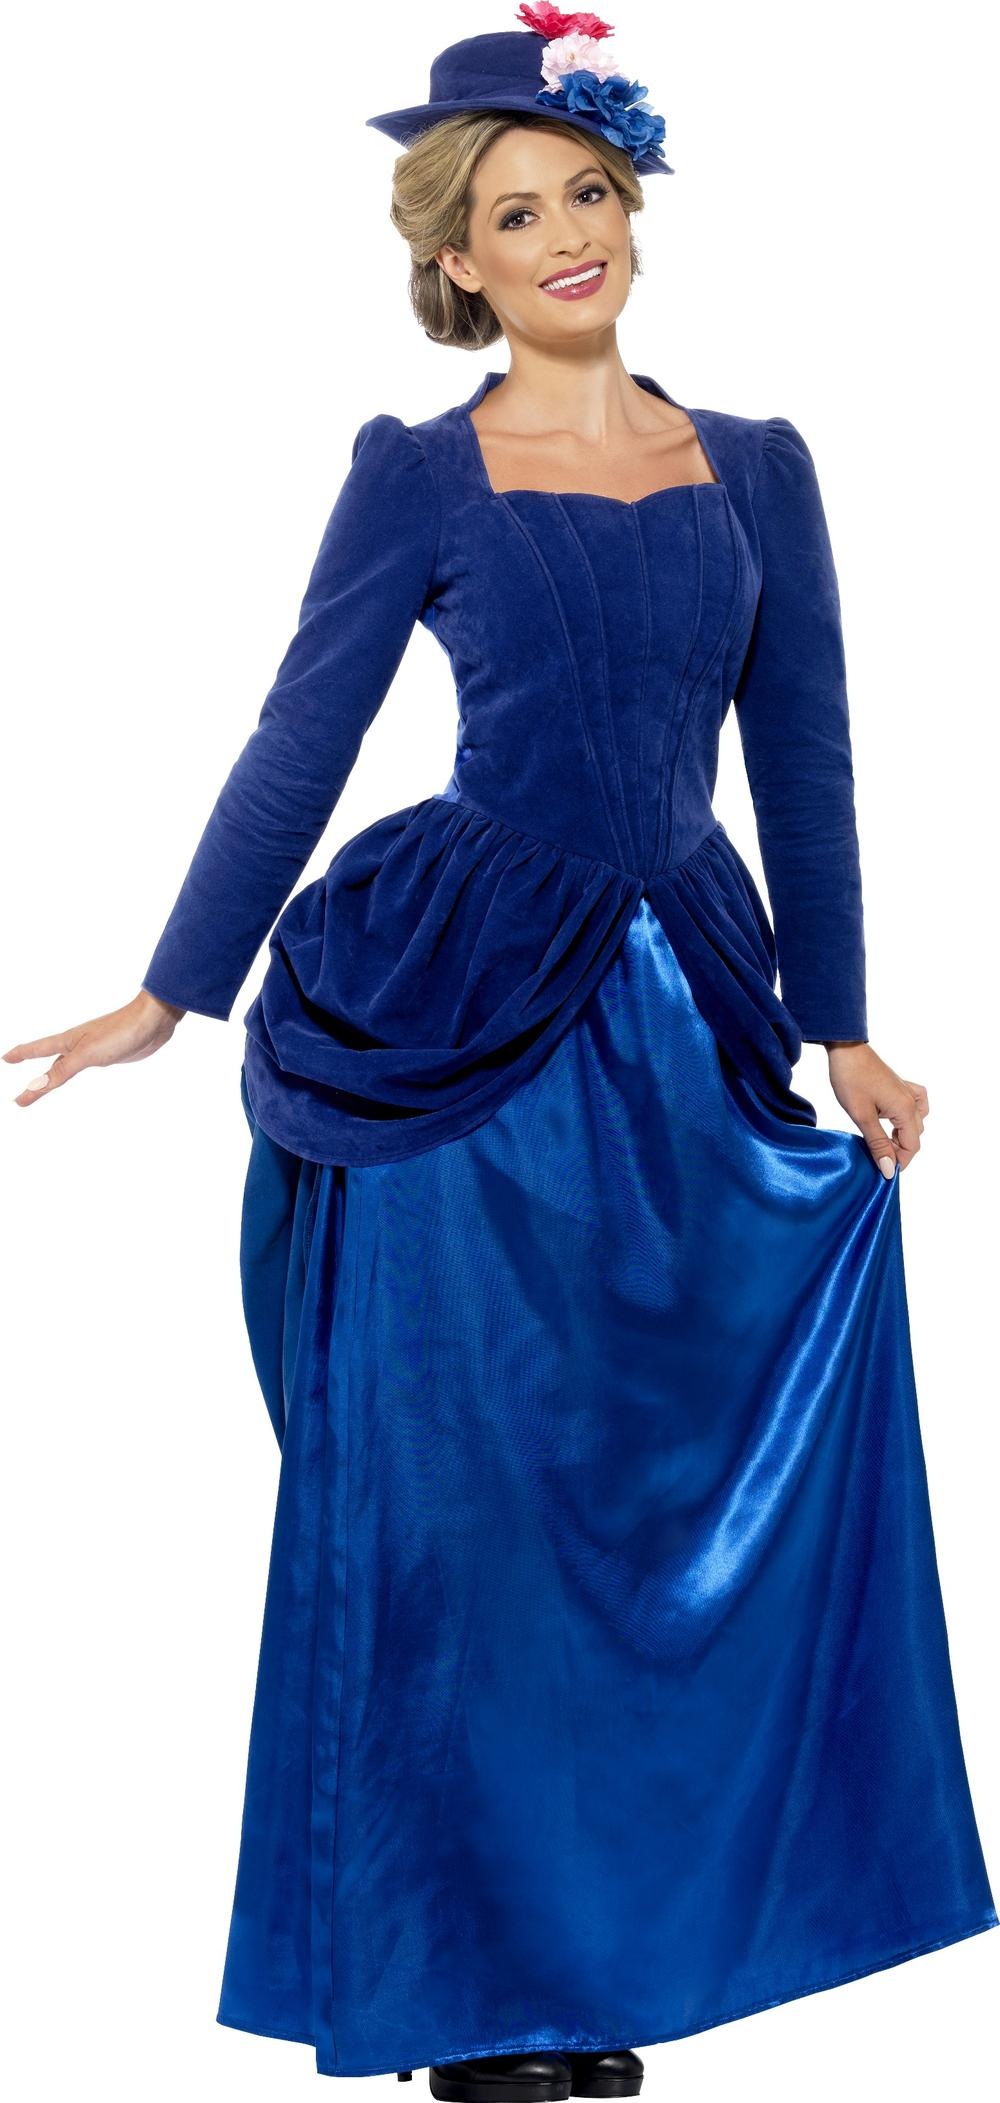 Deluxe Victorian Vixen Ladies Fancy Dress Edwardian Nanny Adults Costume Outfit